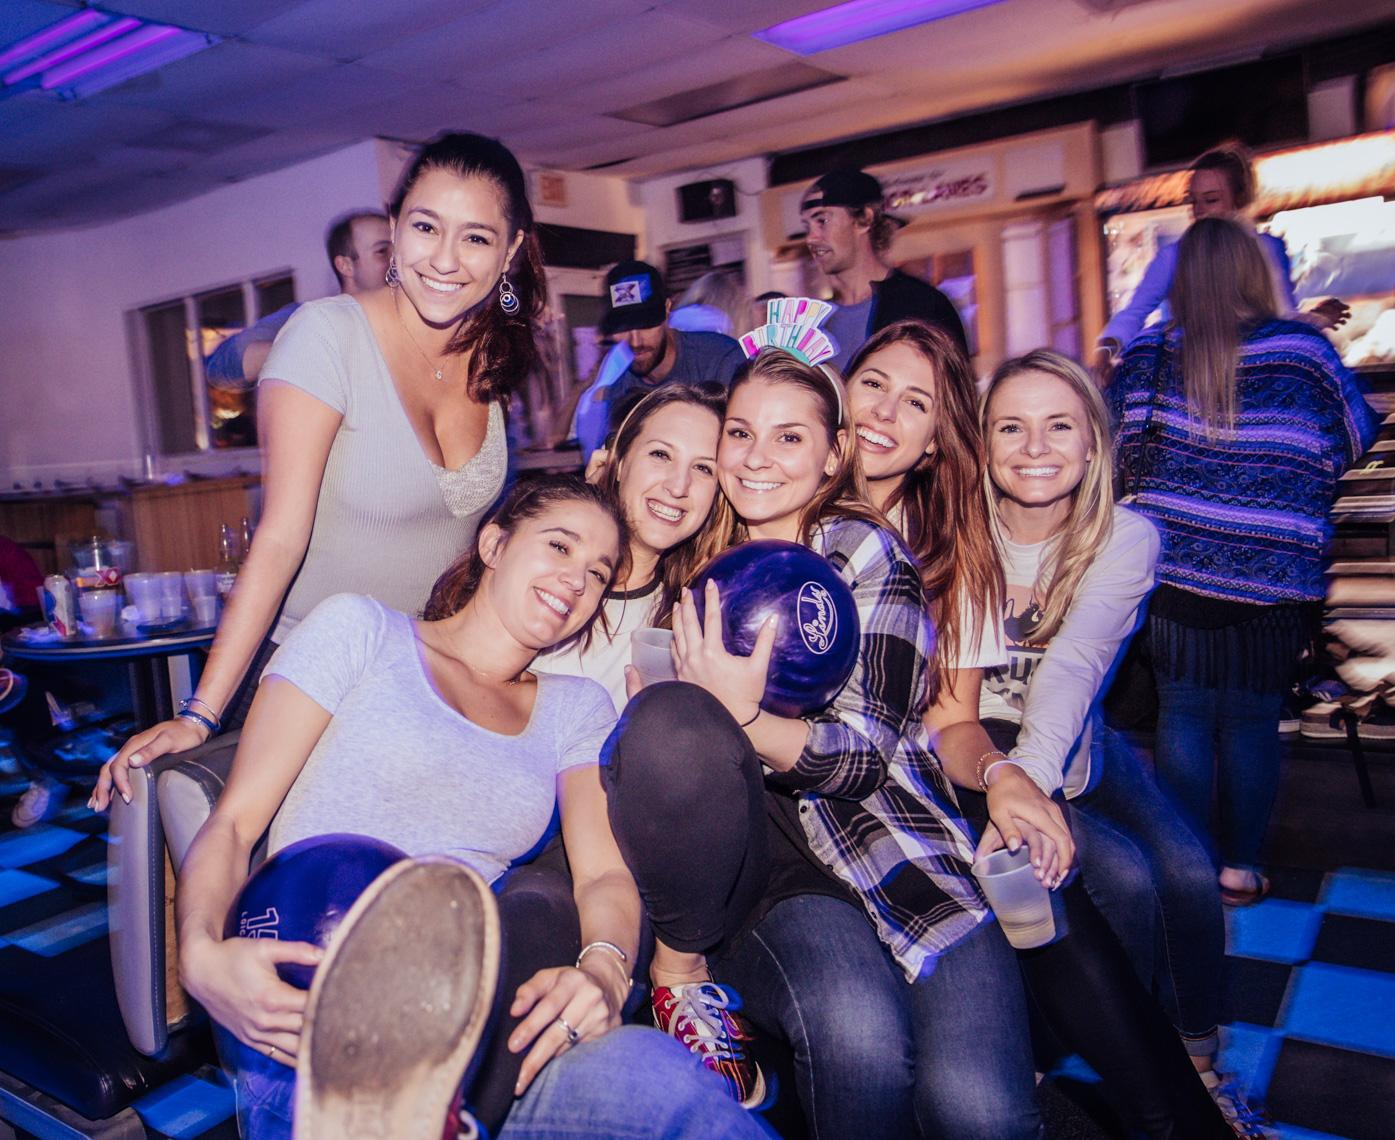 BowlingParty_3_22_19_186.jpg